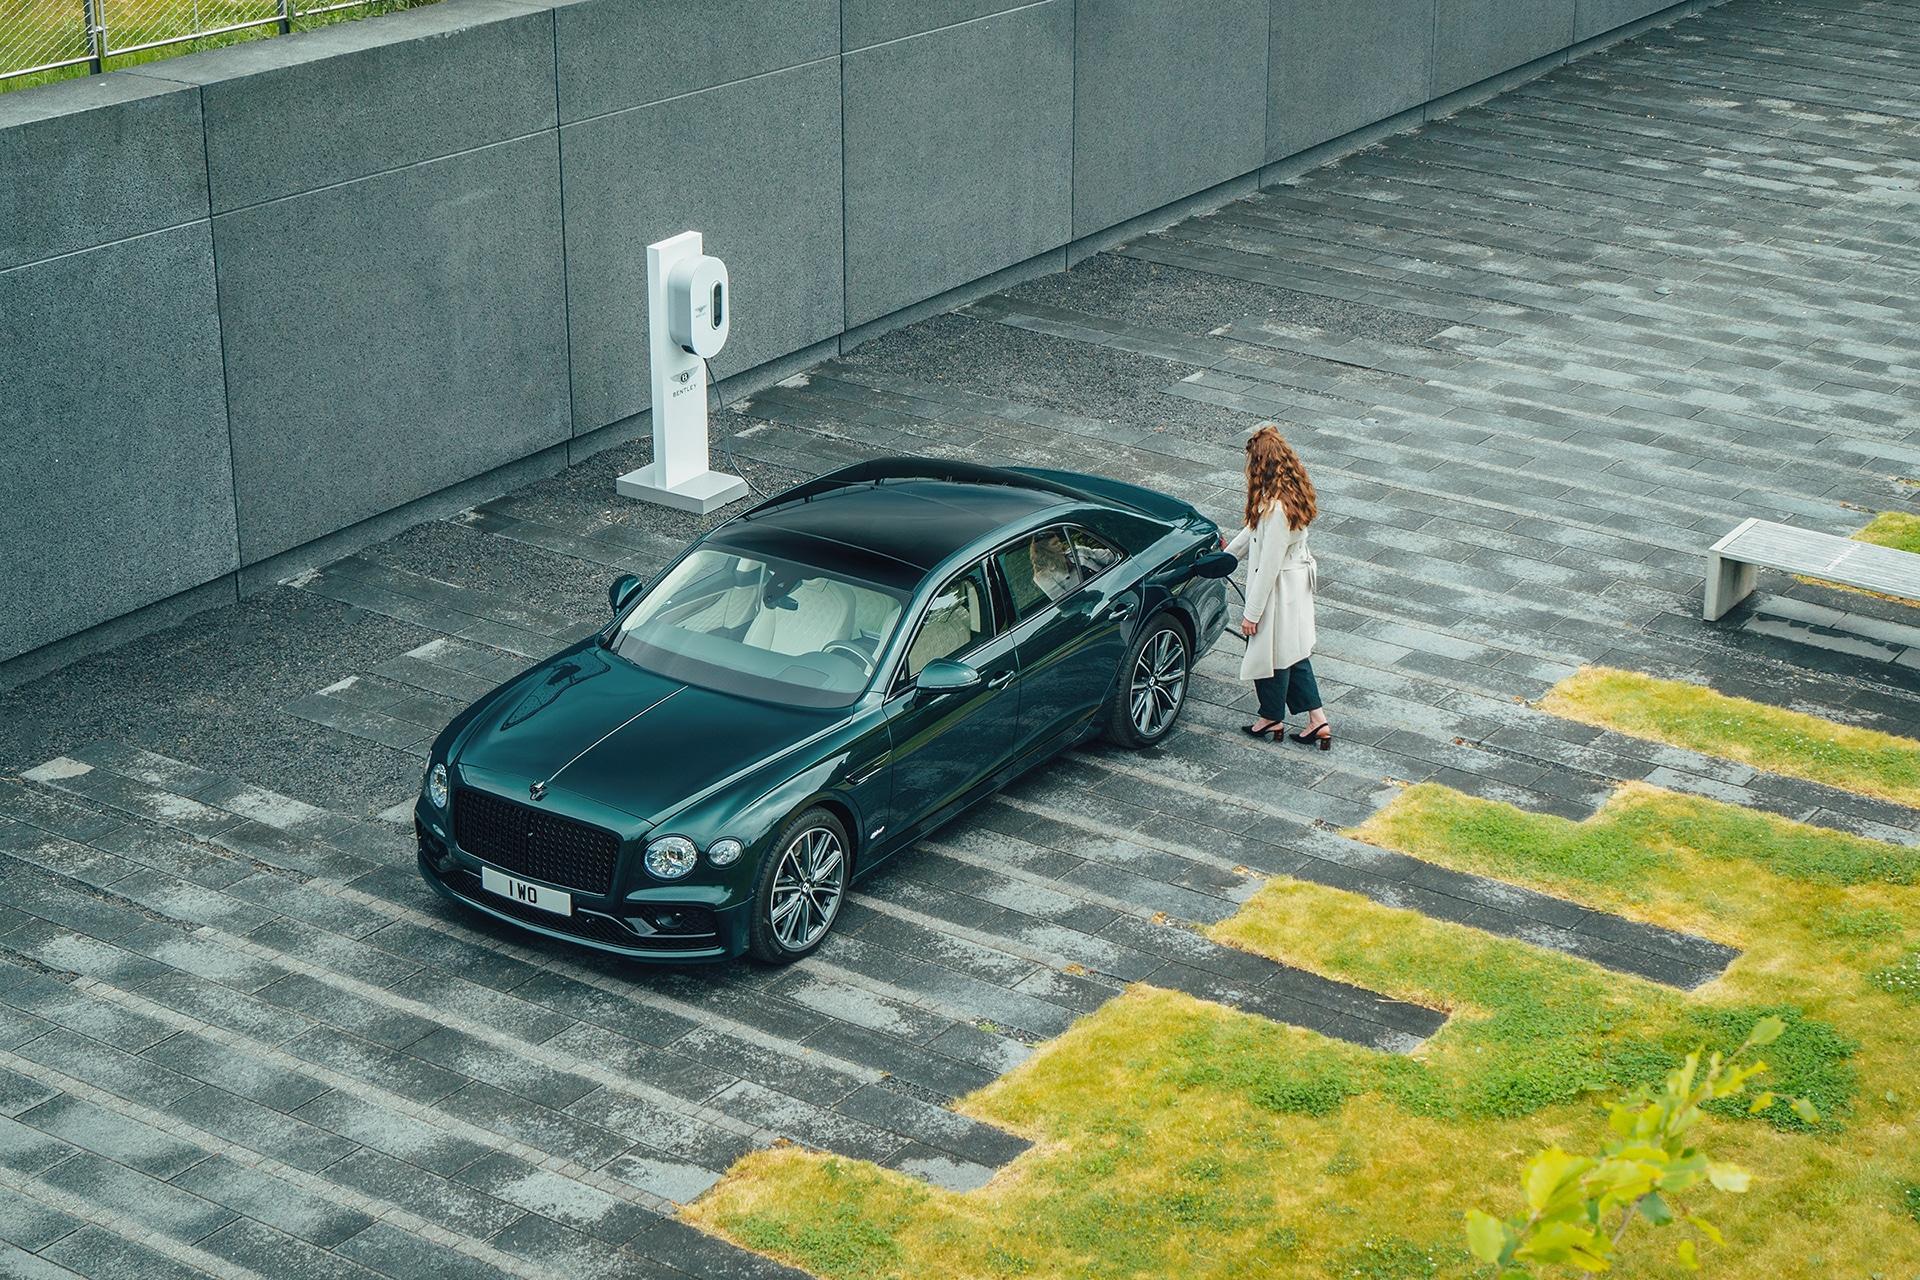 BENTLEY Flying Spur Hybrid 5 ΝΕΑ FLYING SPUR HYBRID : Ακόμα μία πράσινη Bentley Bentley, Bentley Flying Spur, Bentley Flying Spur Hybrid, Hybrid, ειδήσεις, Νέα, υβριδικό